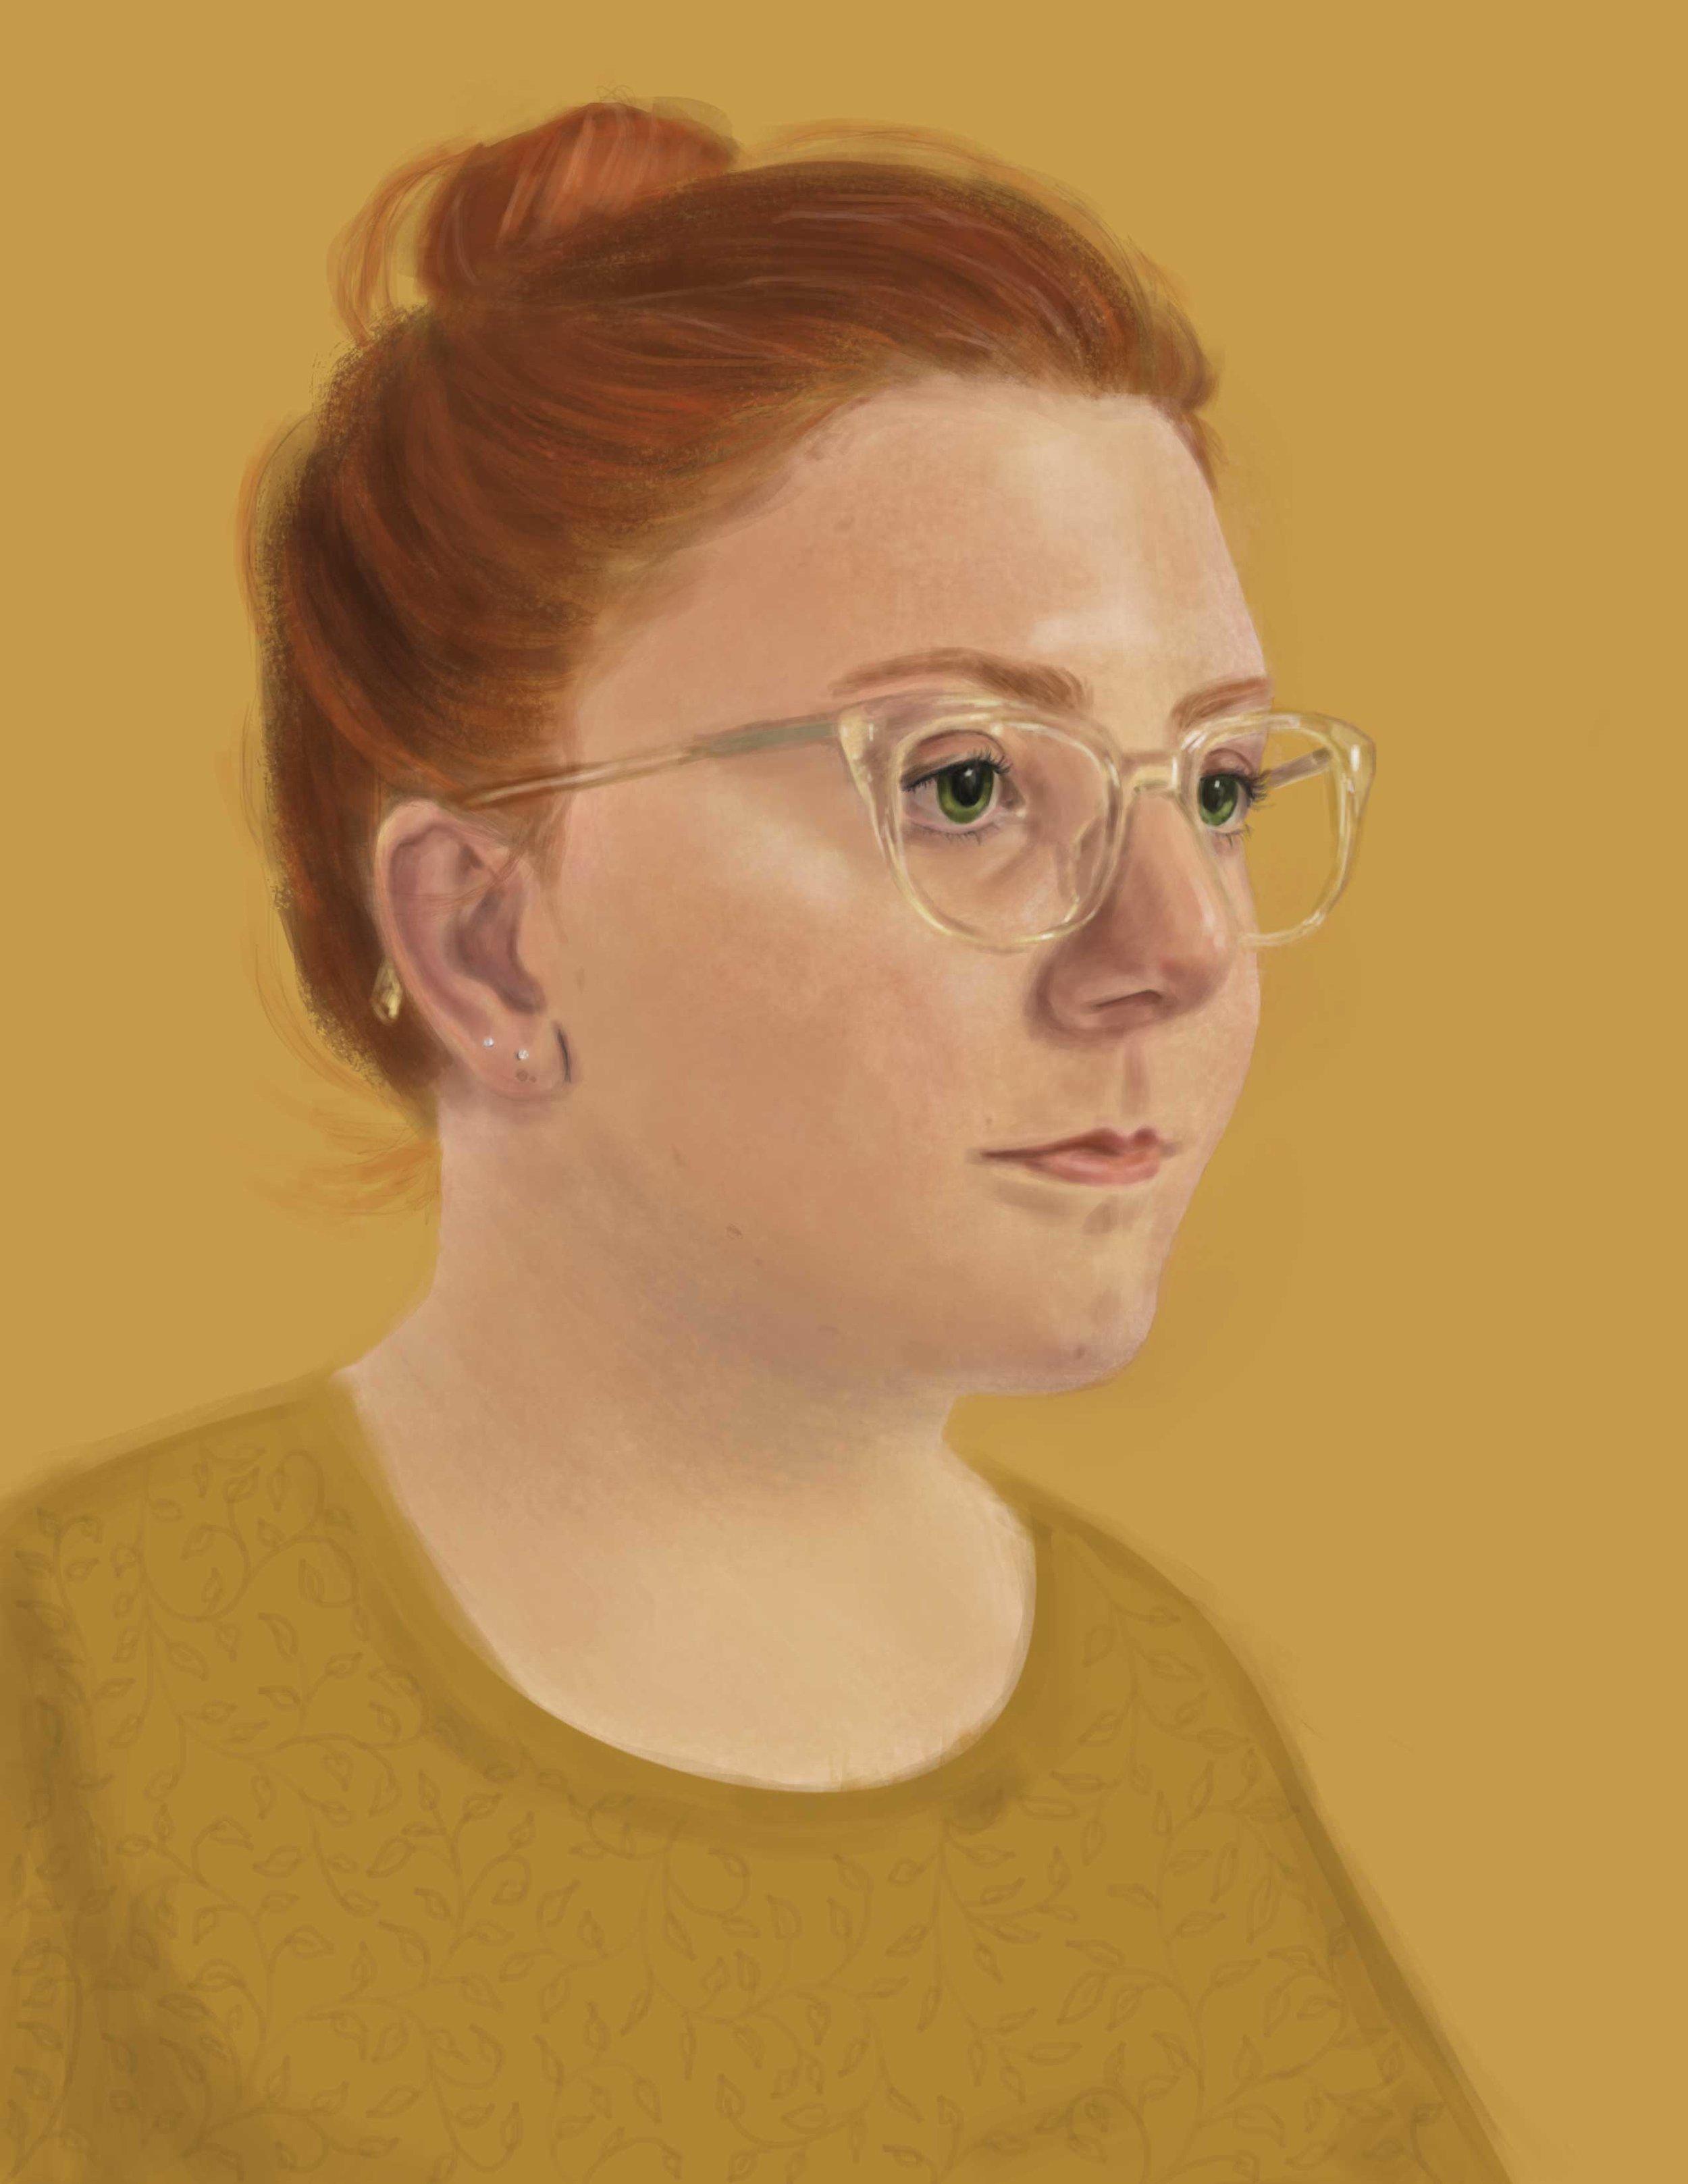 Self-portrait, 2019